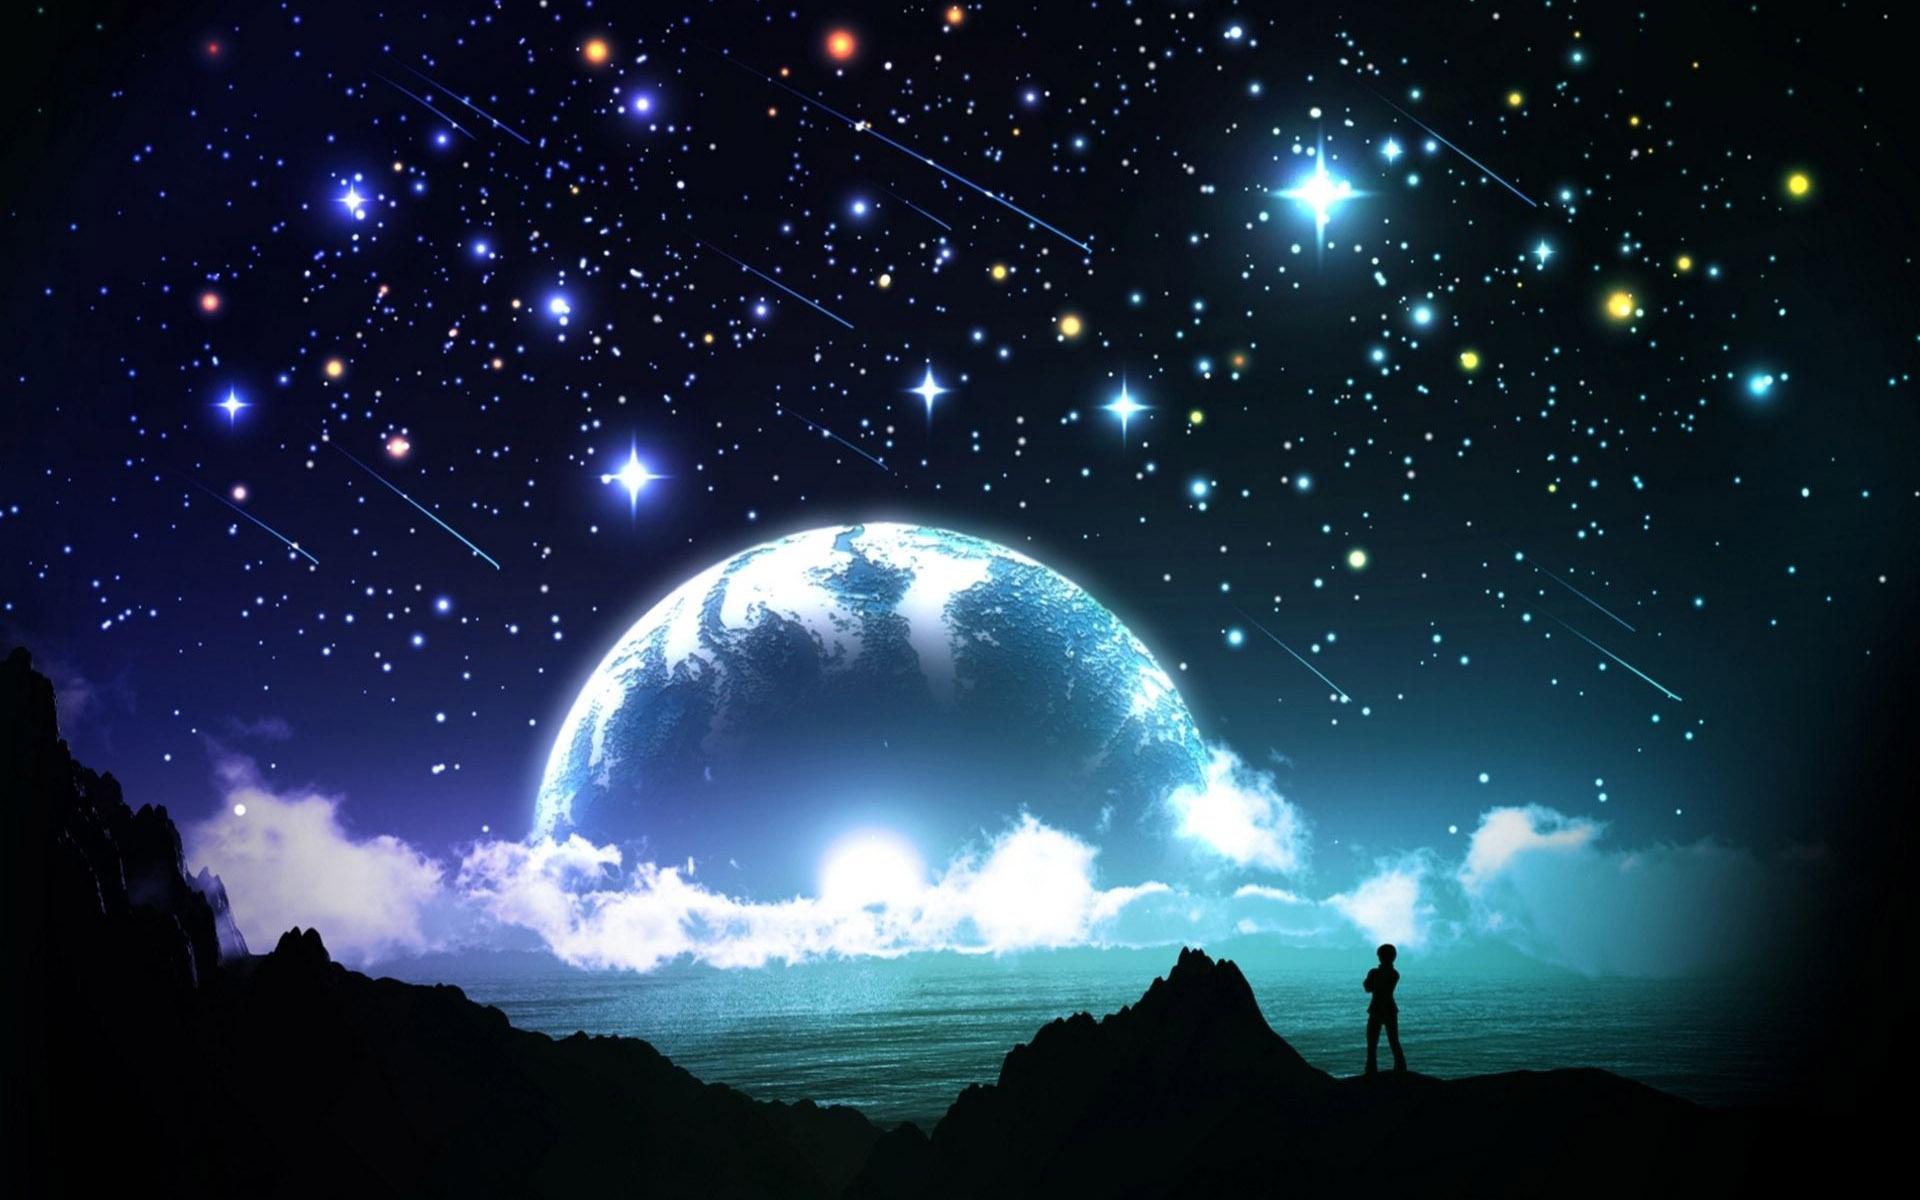 Night Moon Romance Love Stars Sky Clouds Wallpaper: [43+] Wallpaper Stars Sky Night On WallpaperSafari